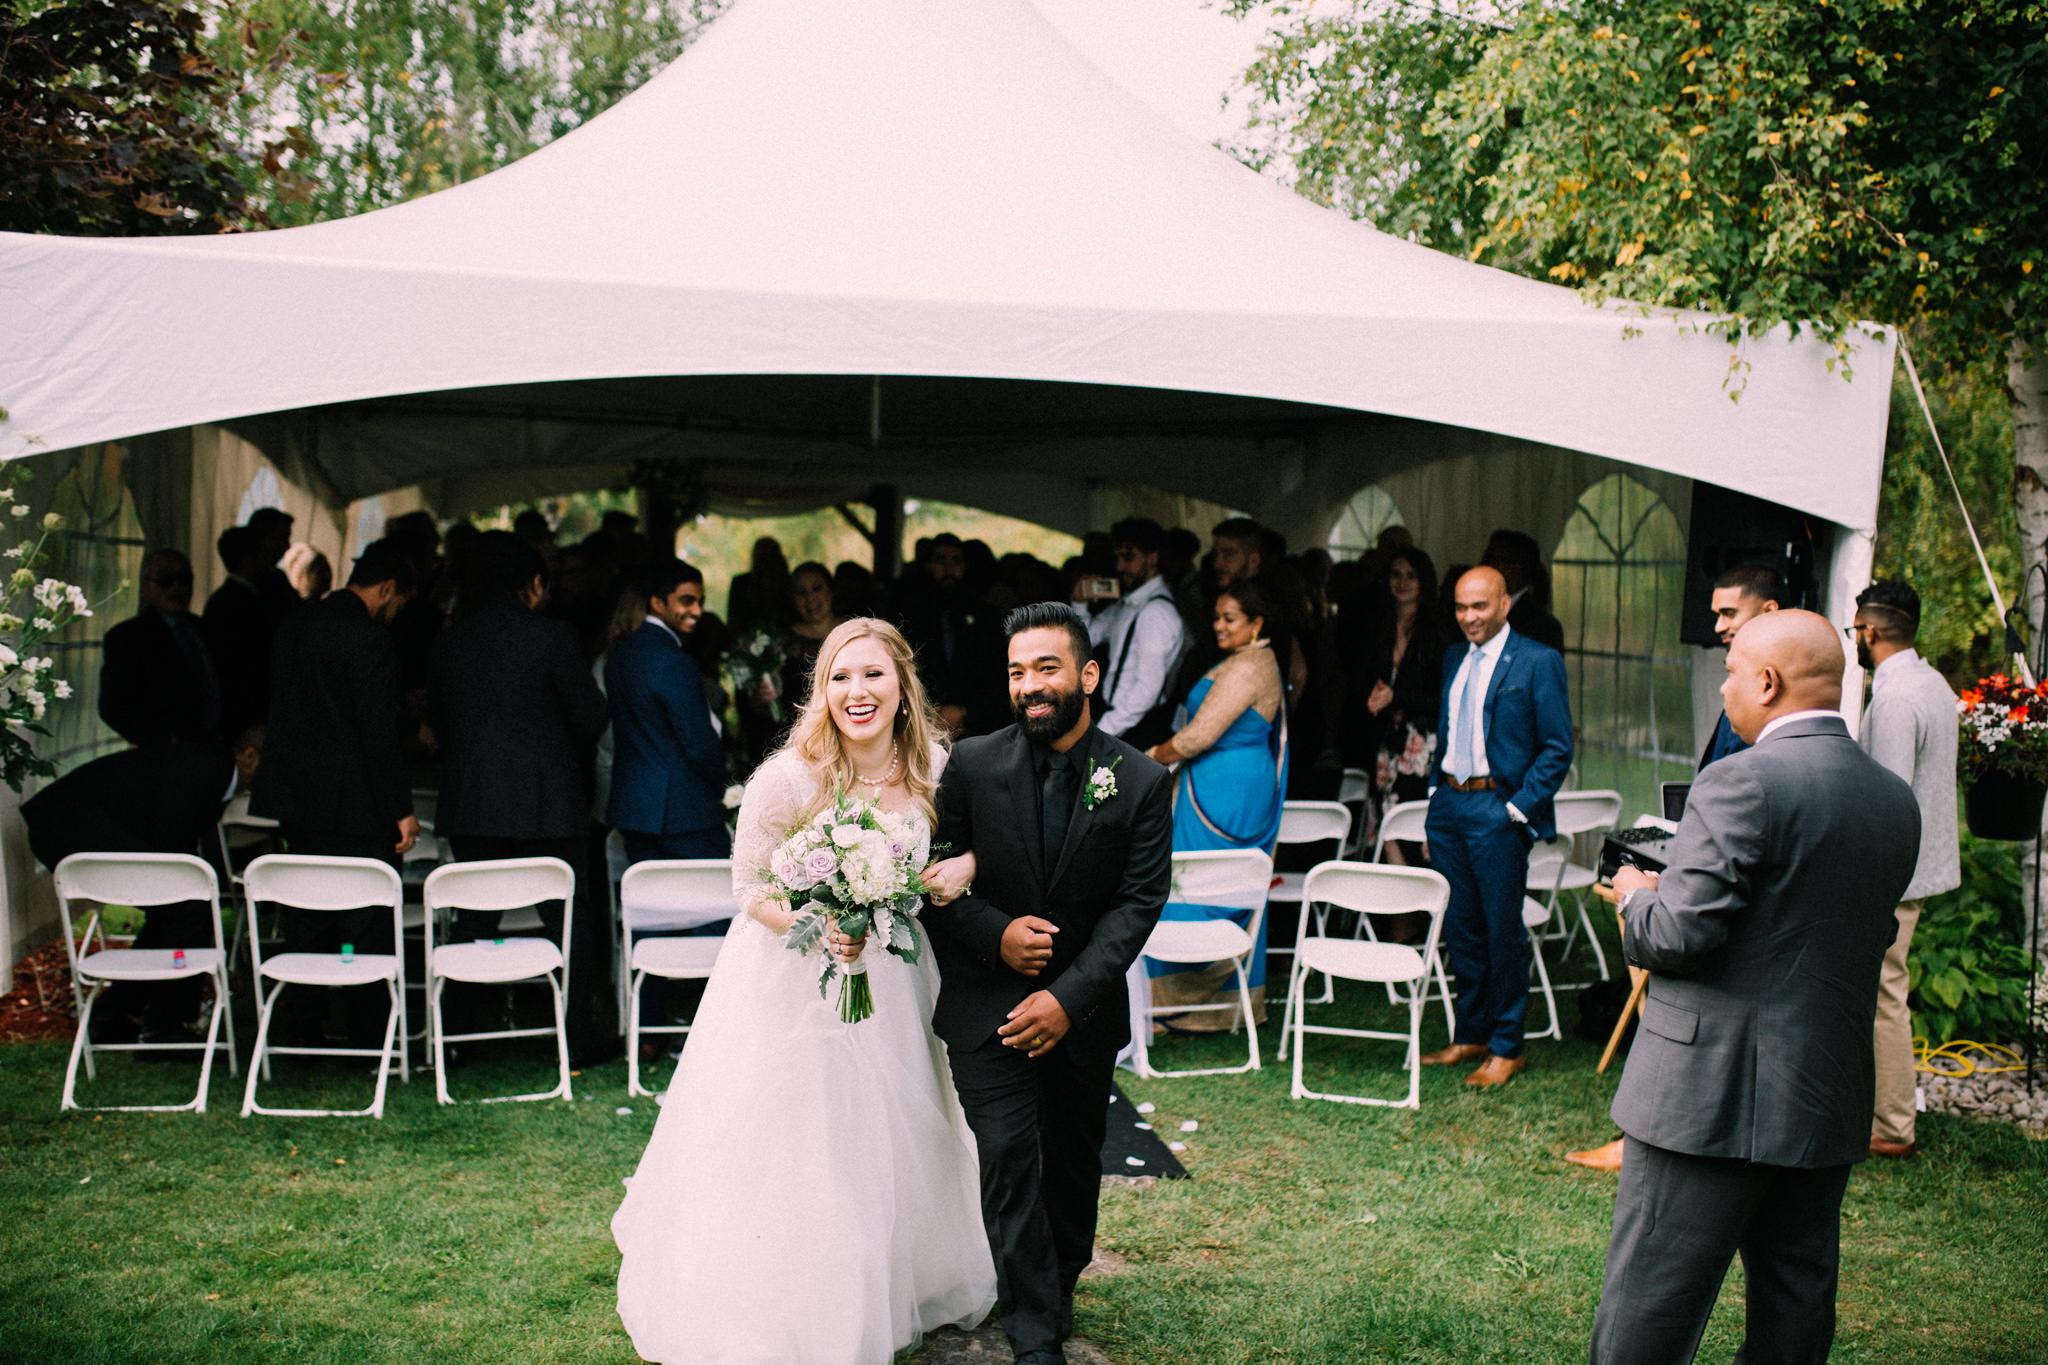 Backyard wedding in Brechin by Max Wong Photo (30)